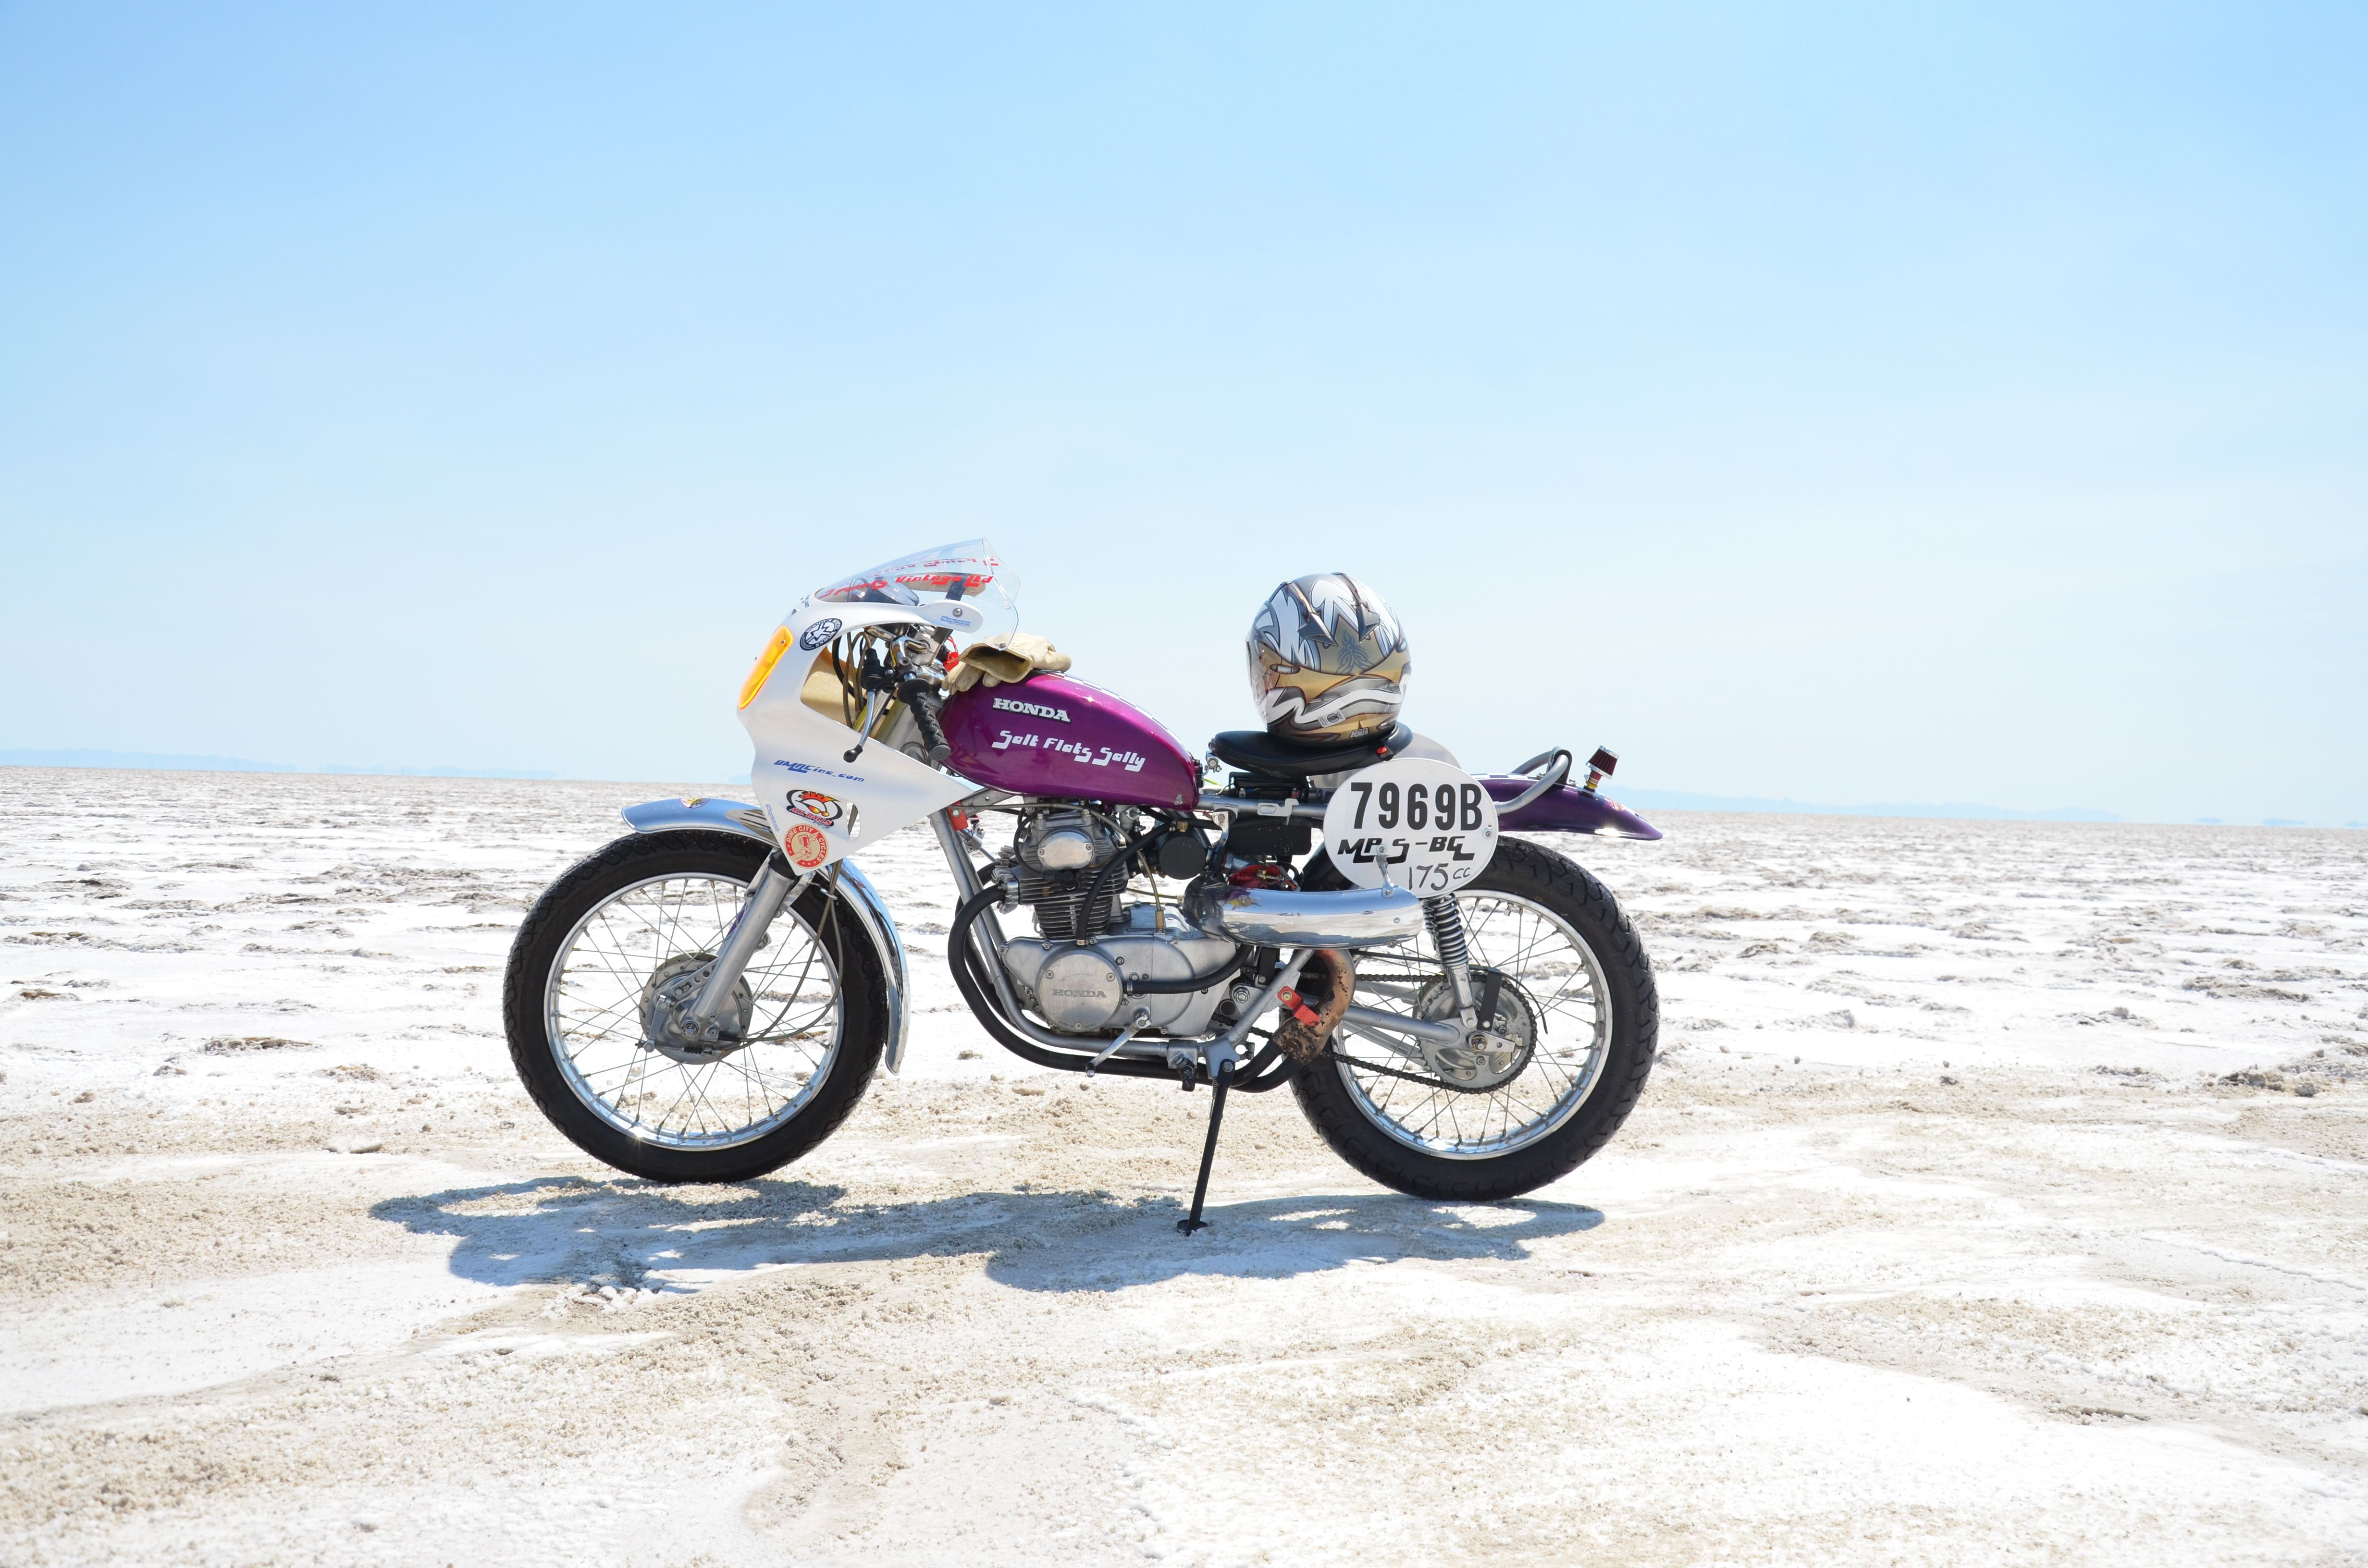 Honda Turbo 175cc World Record BIke